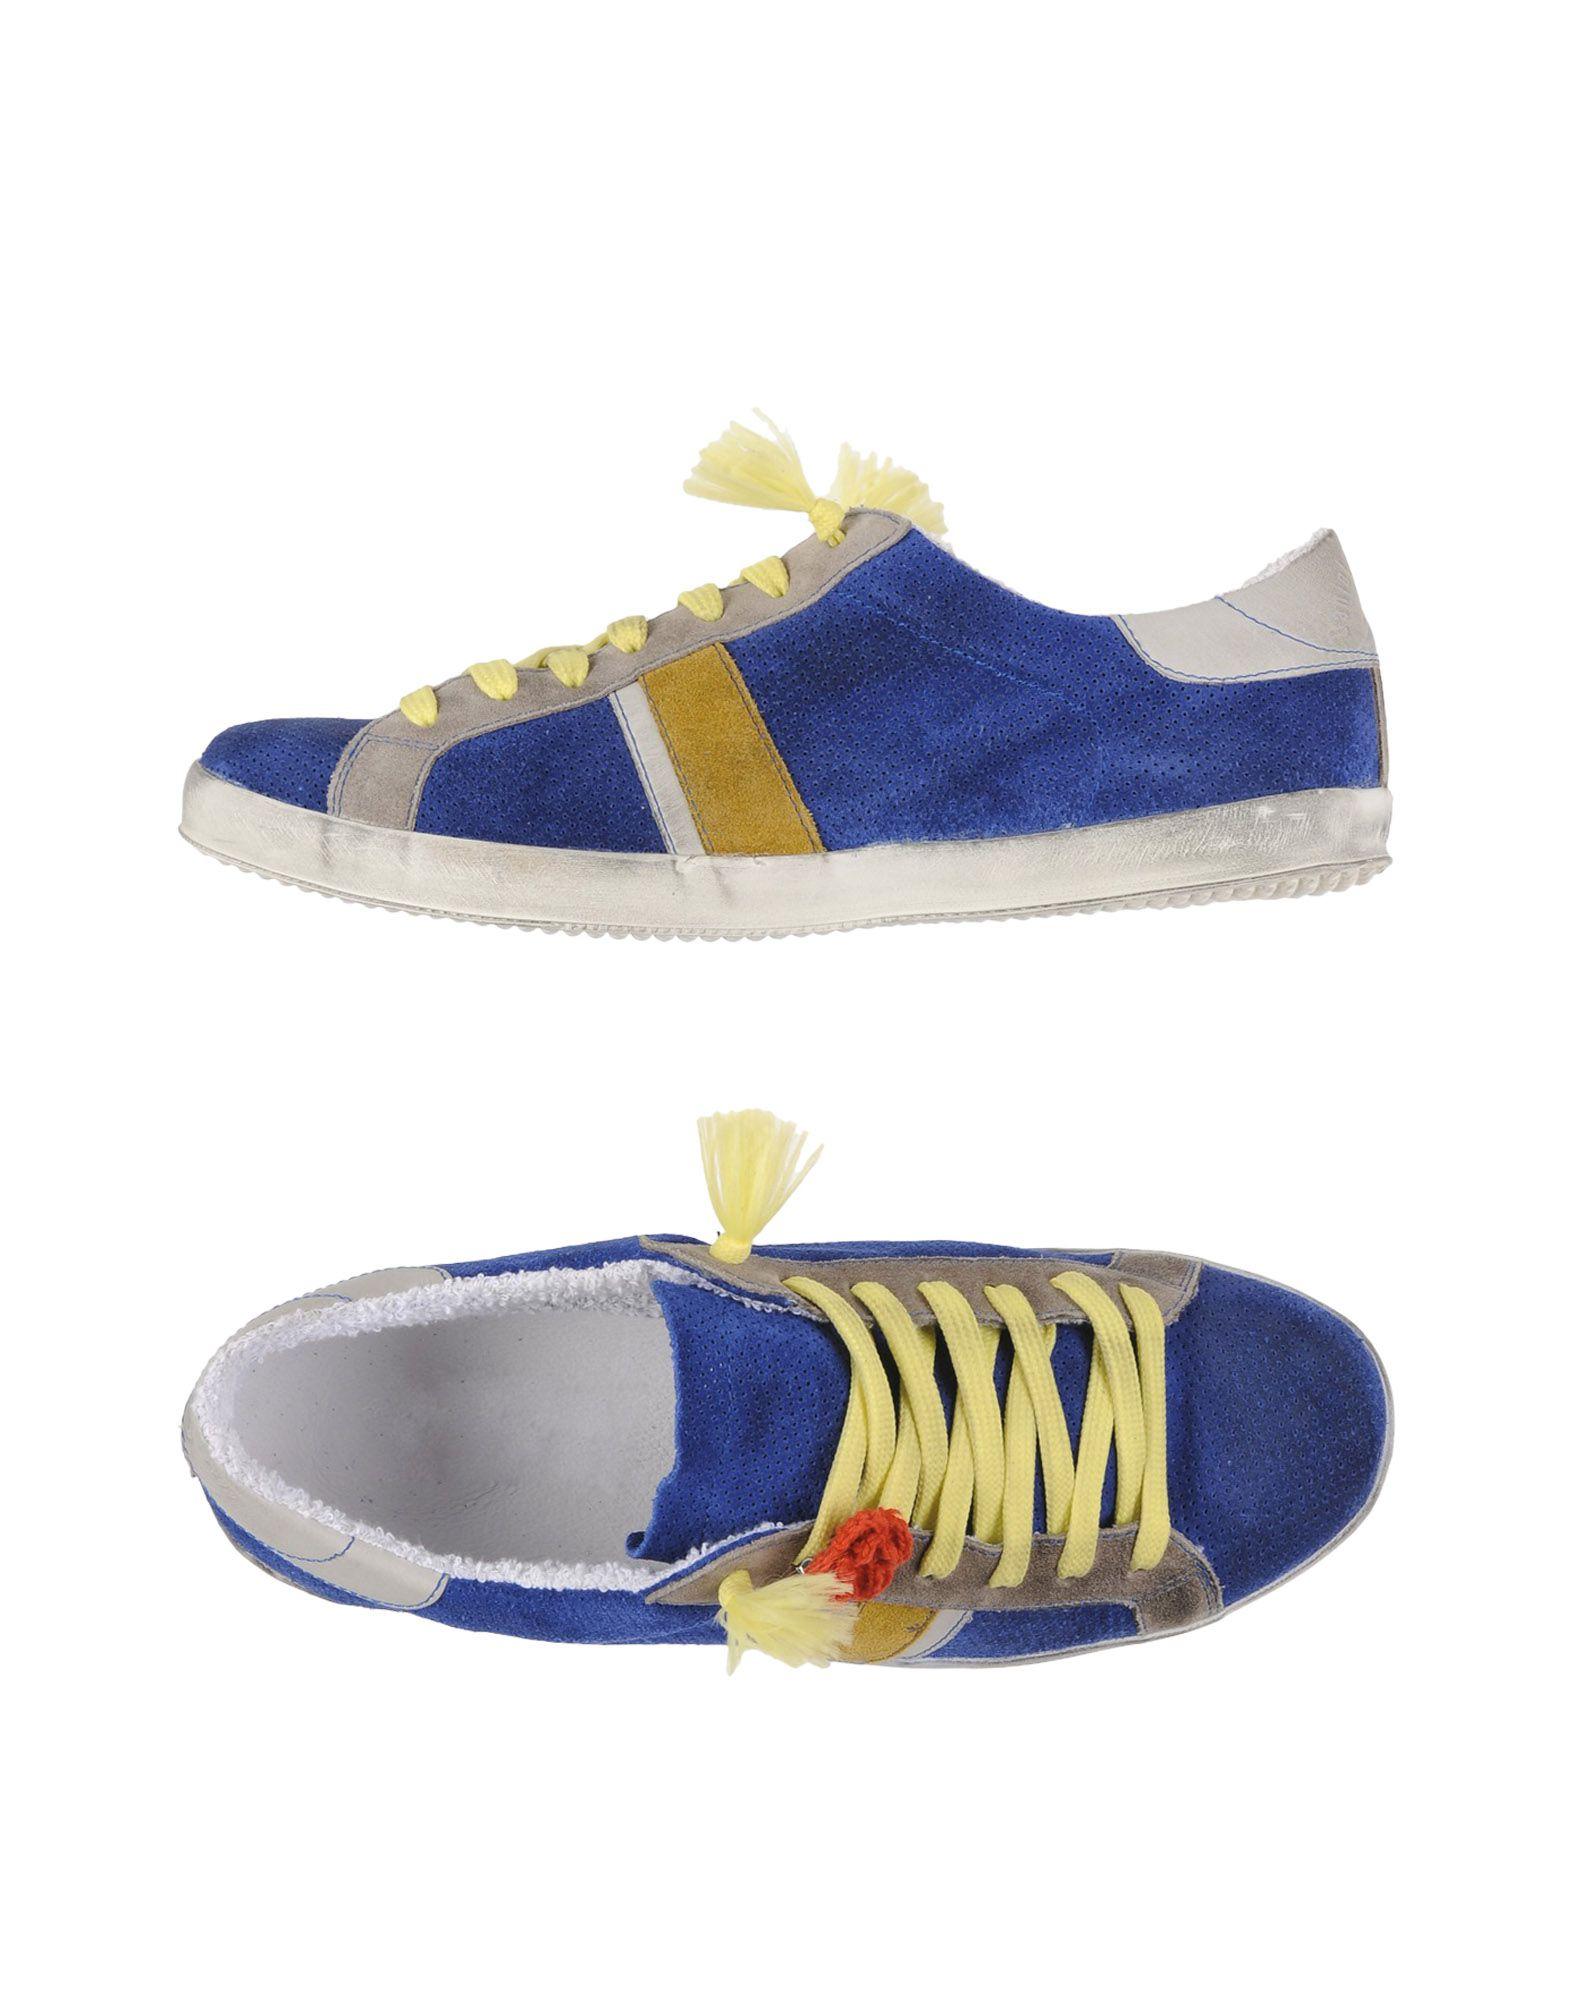 Sneakers Daniele Alessandrini Uomo - 11193163IO